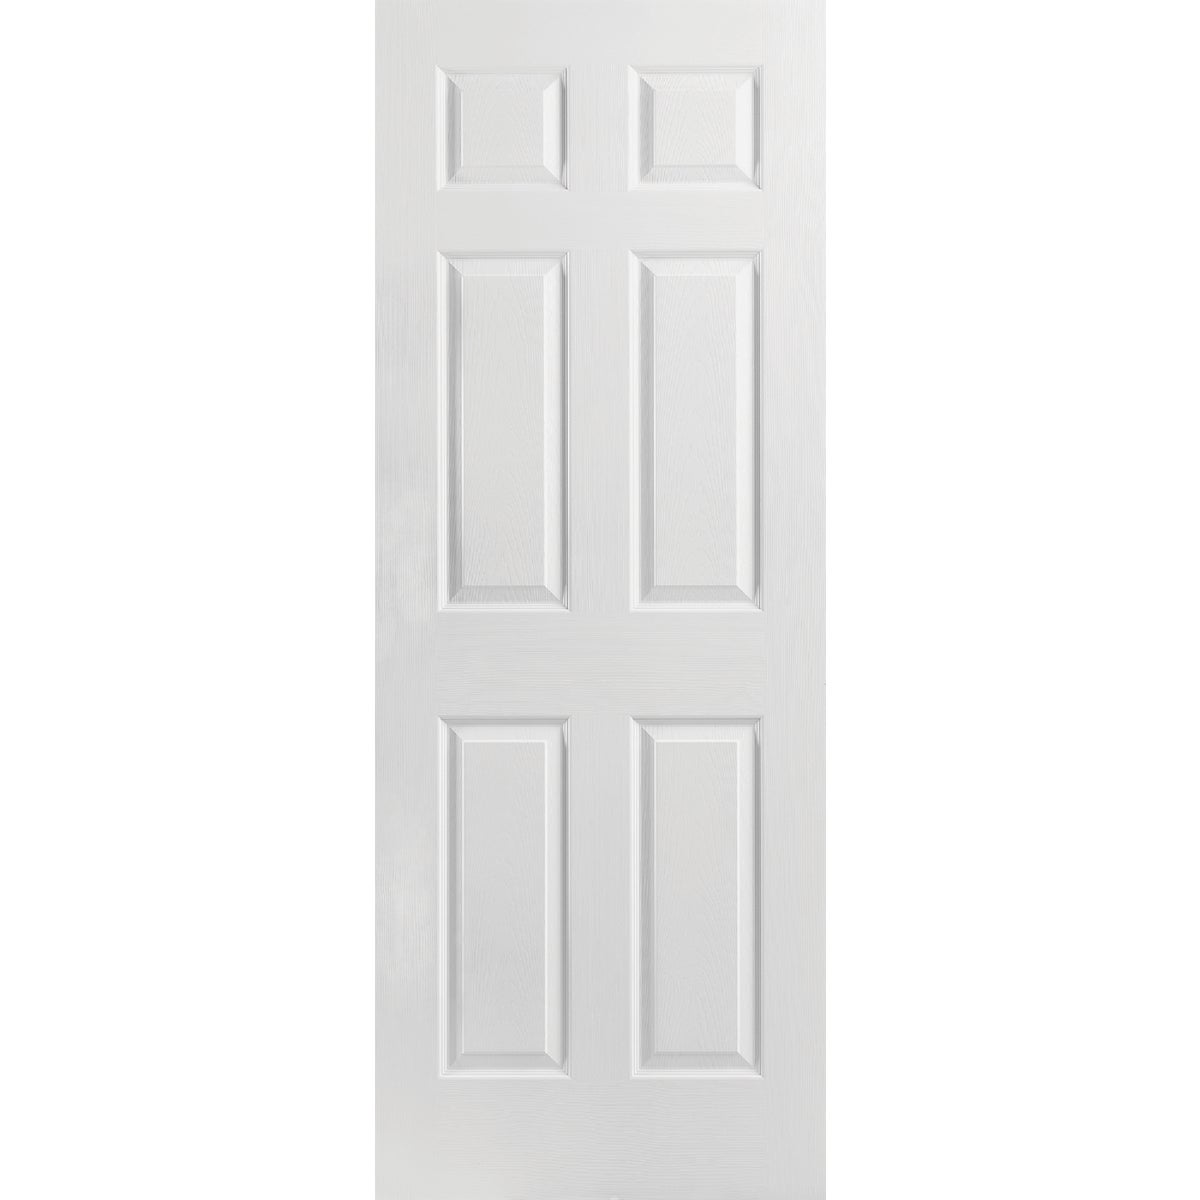 Masonite 2/4 1-3/8 6PN TX HC DOOR